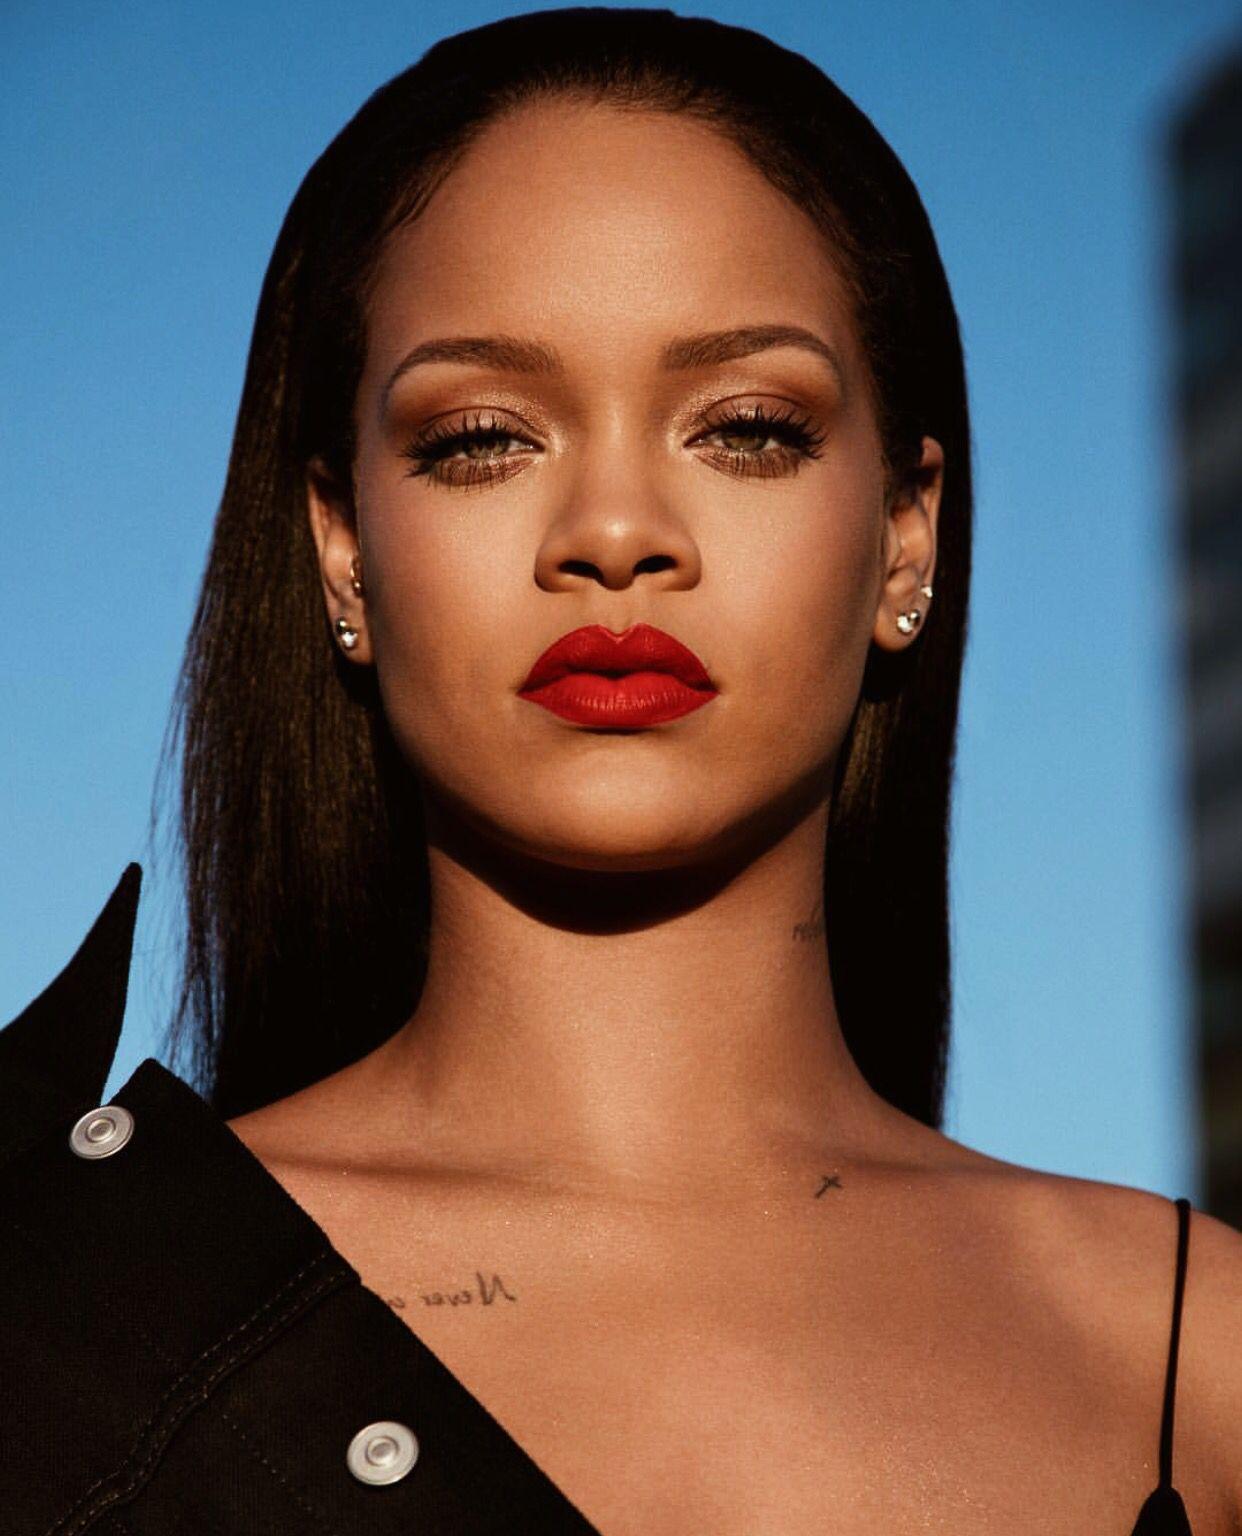 Pin by elly ☀️ burds on beautiful people. Rihanna fenty